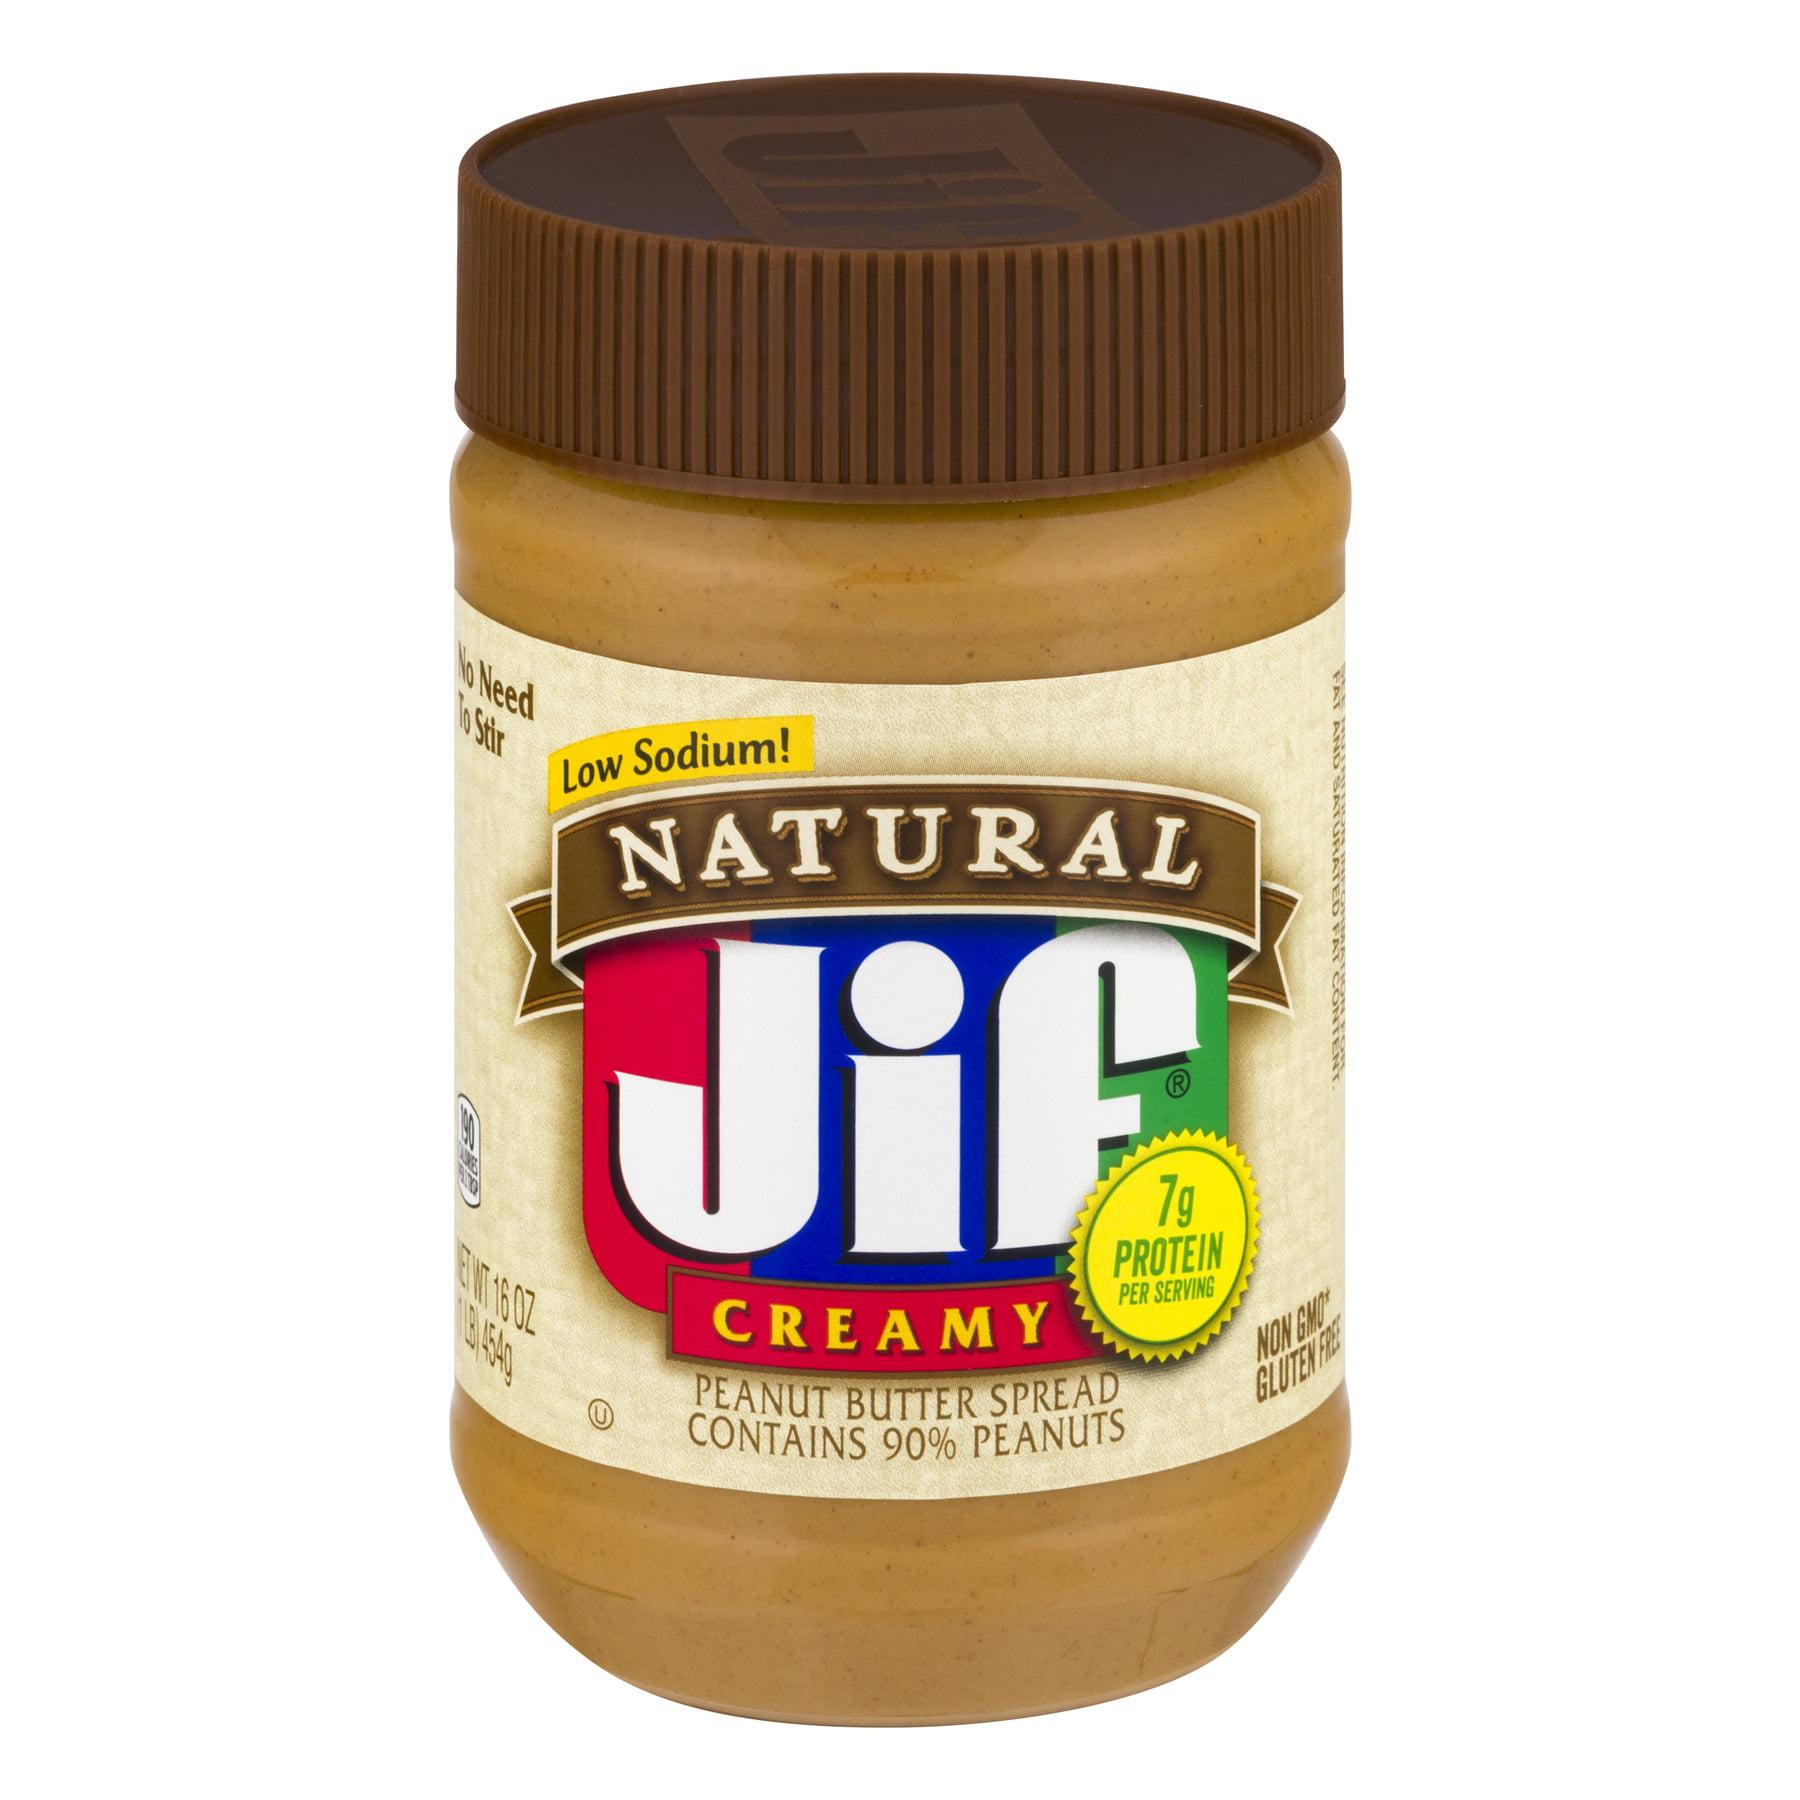 Jif Natural Creamy Peanut Butter, 16 oz